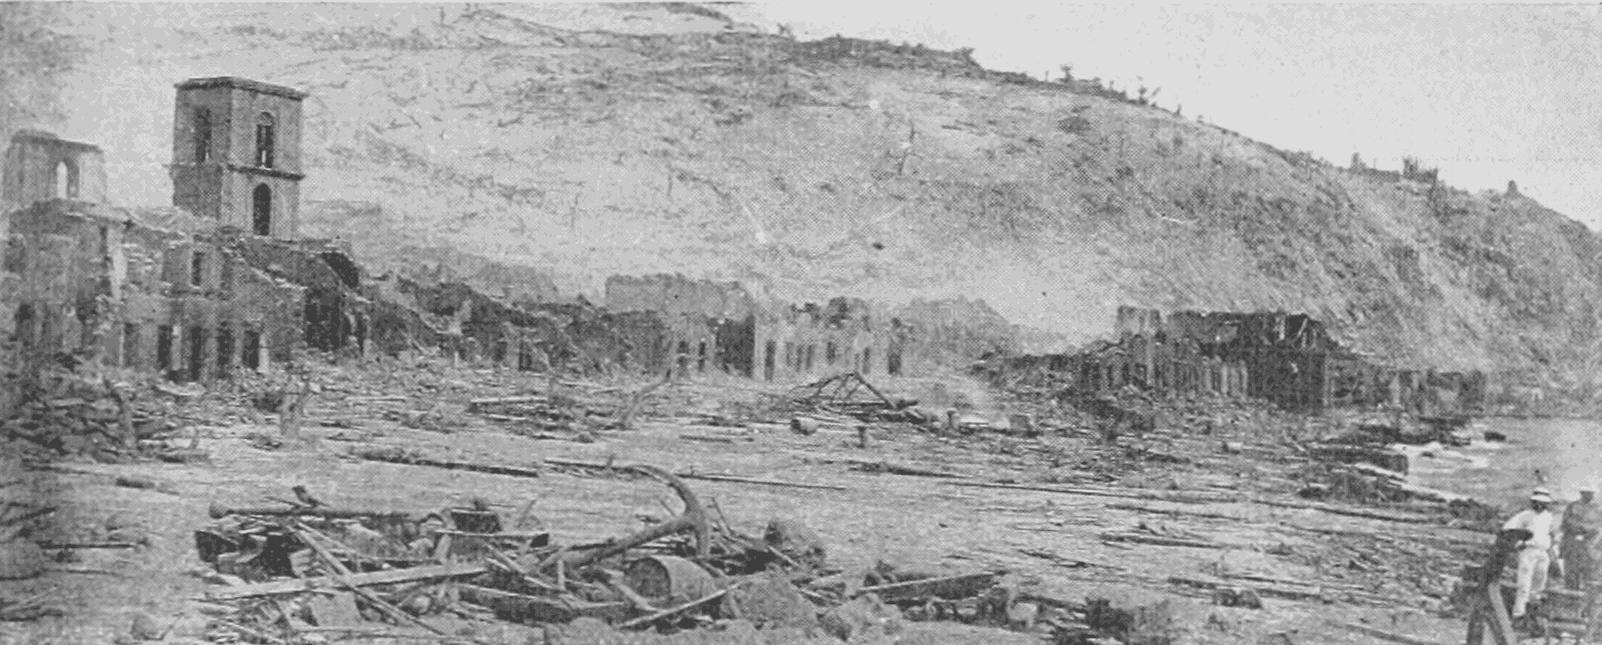 1902, la catastrophe de la Martinique